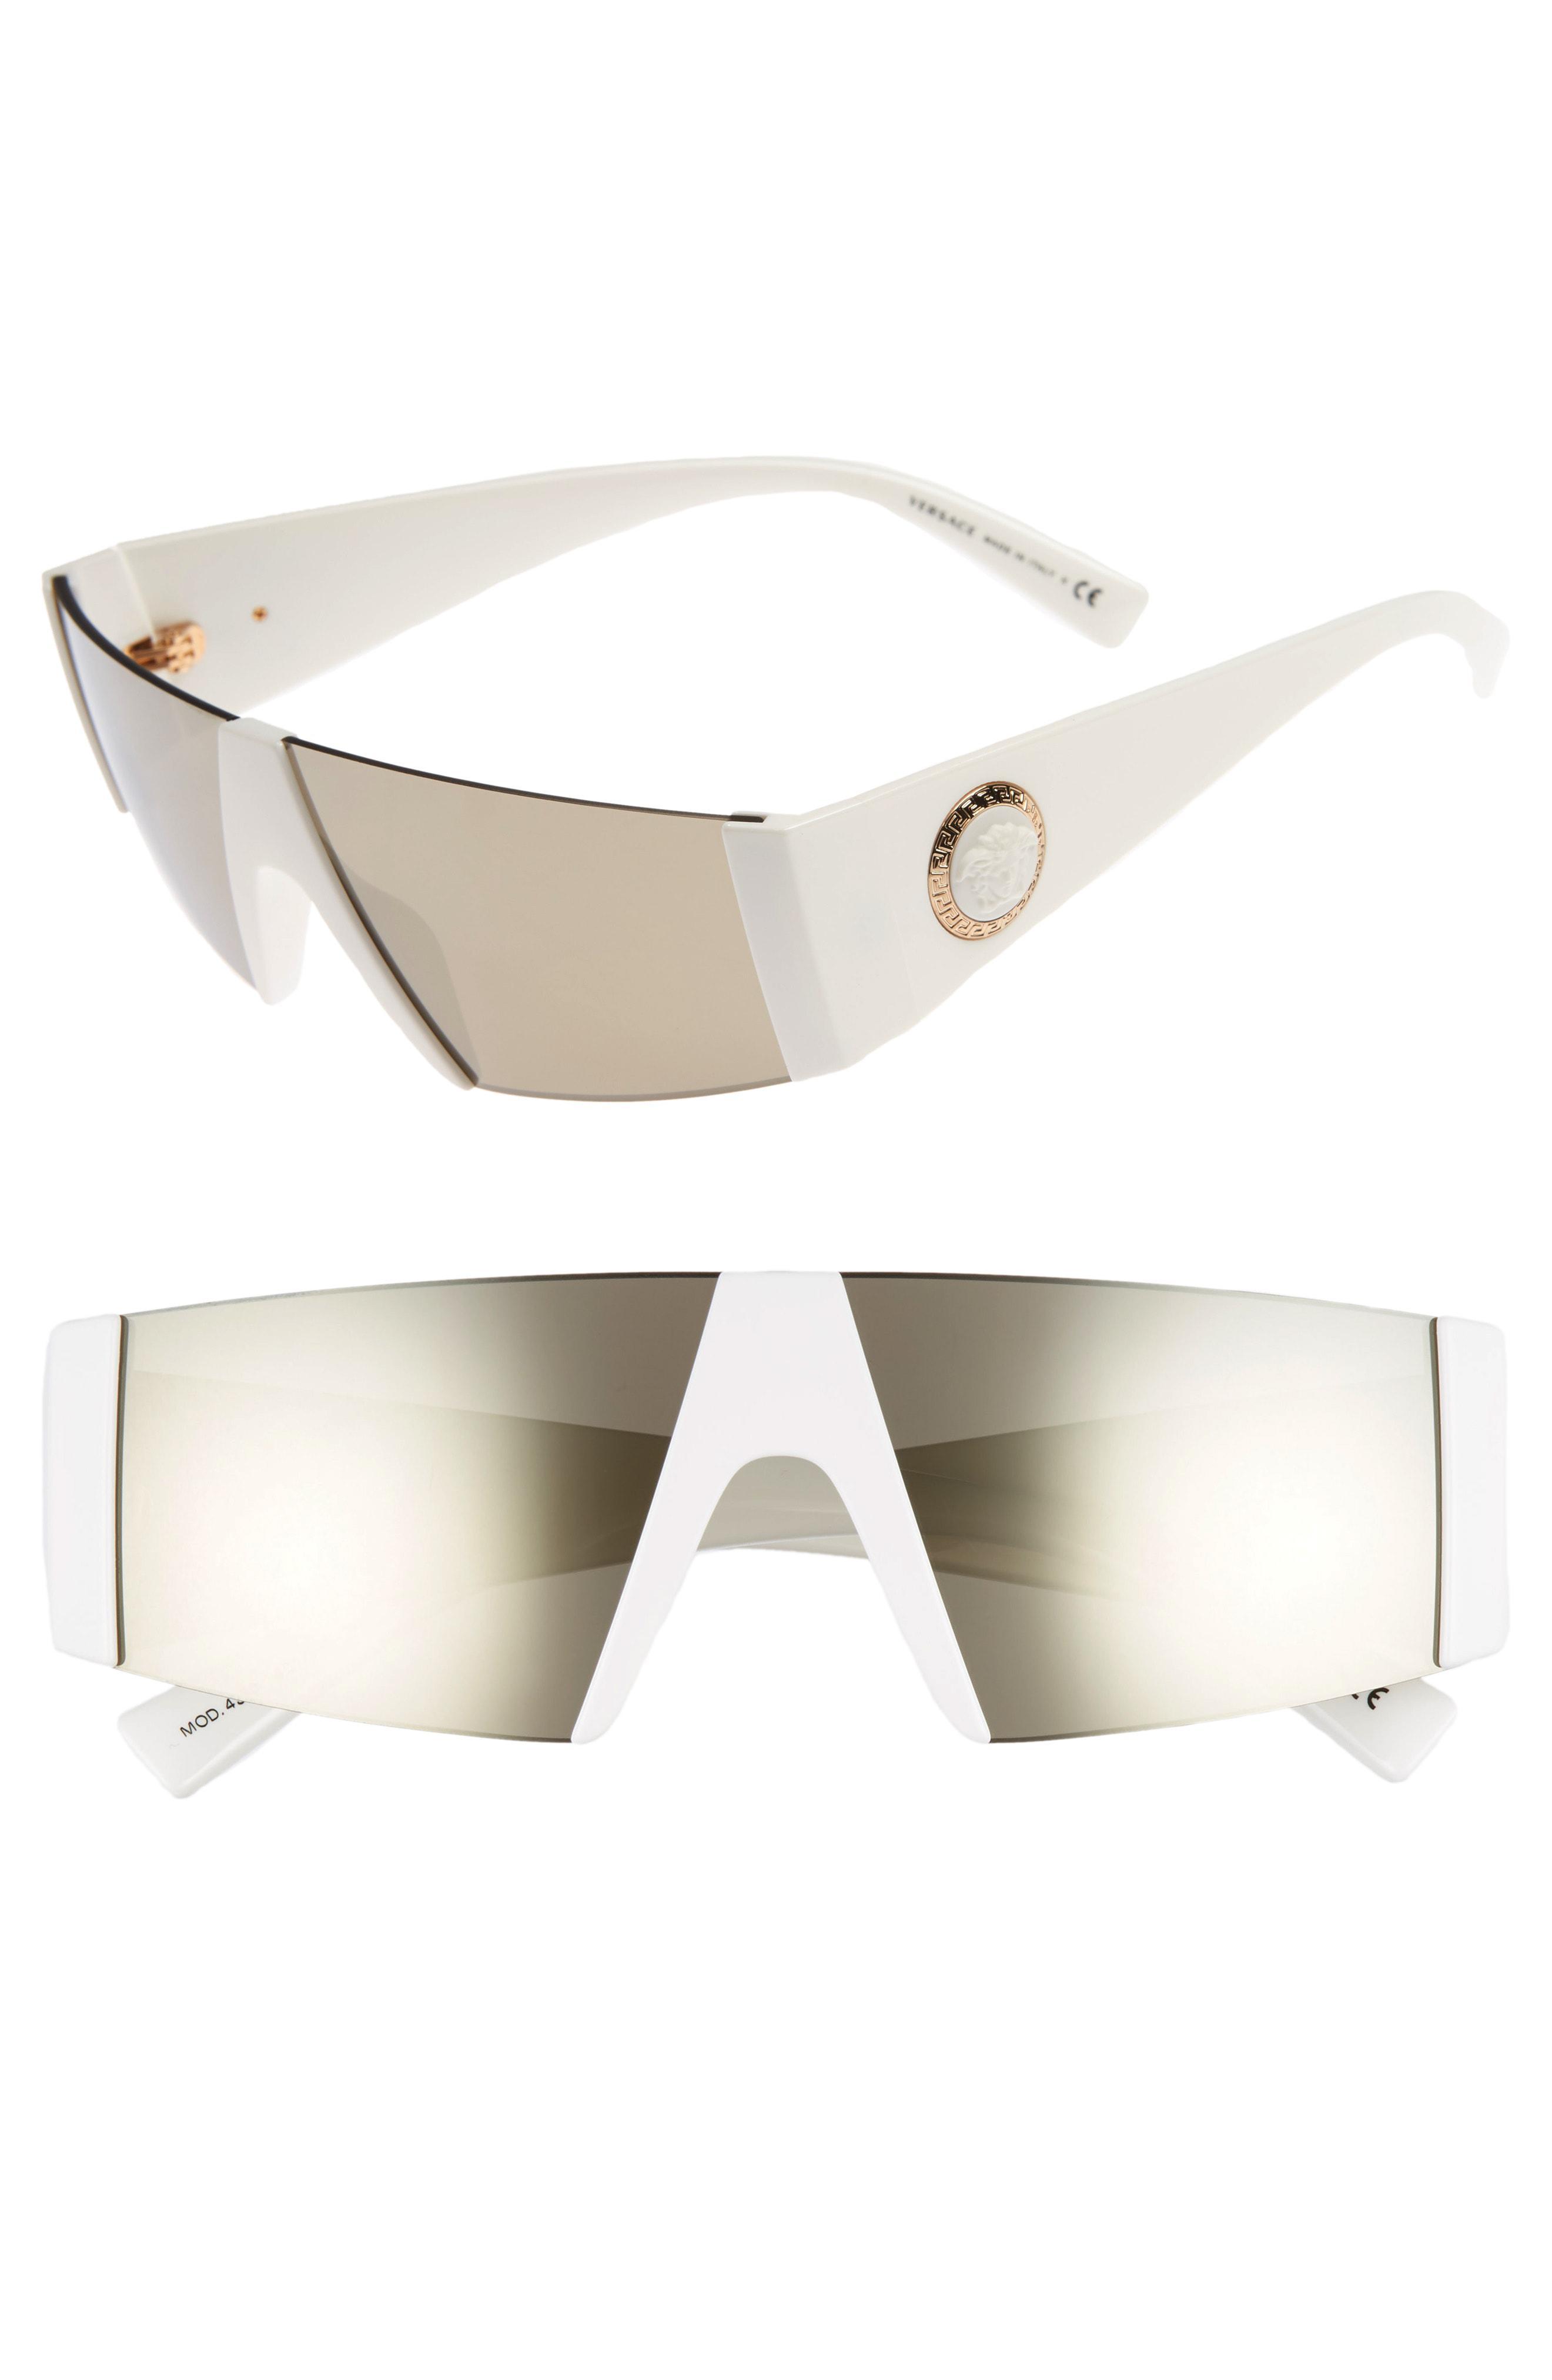 43cd83915c Versace. Women s Medusa 56mm Shield Sunglasses -